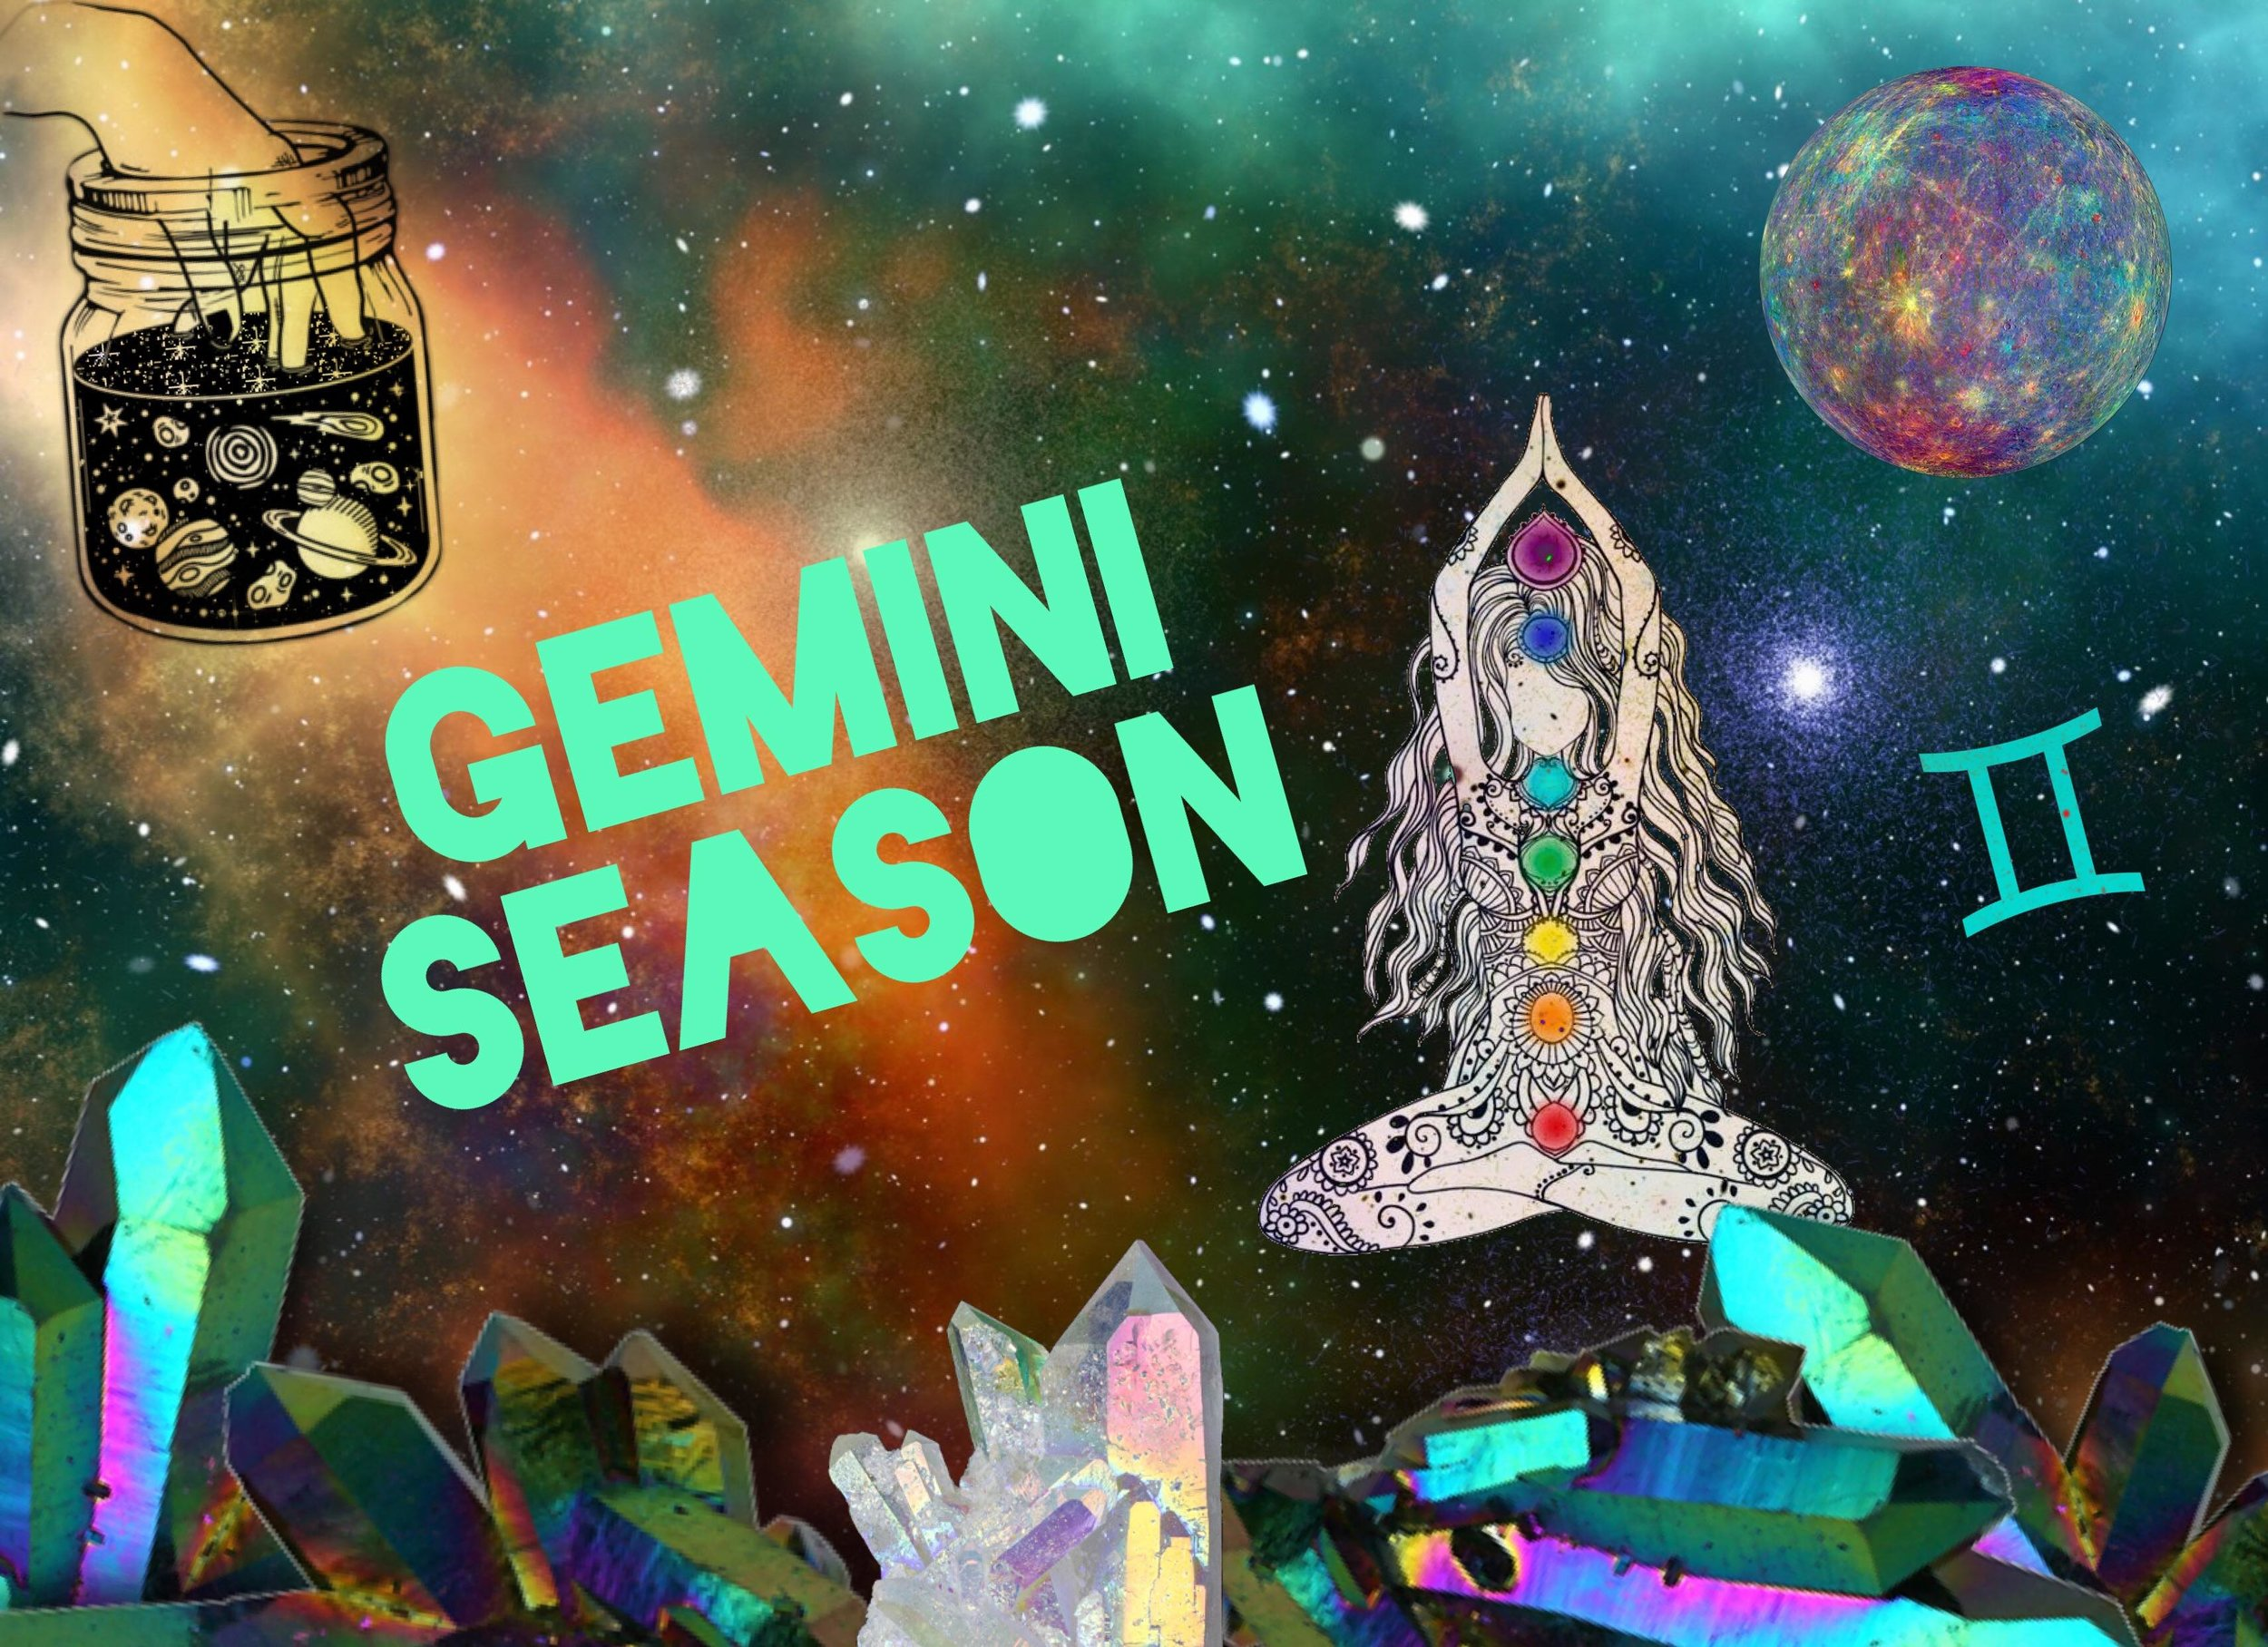 gemini season is upon us